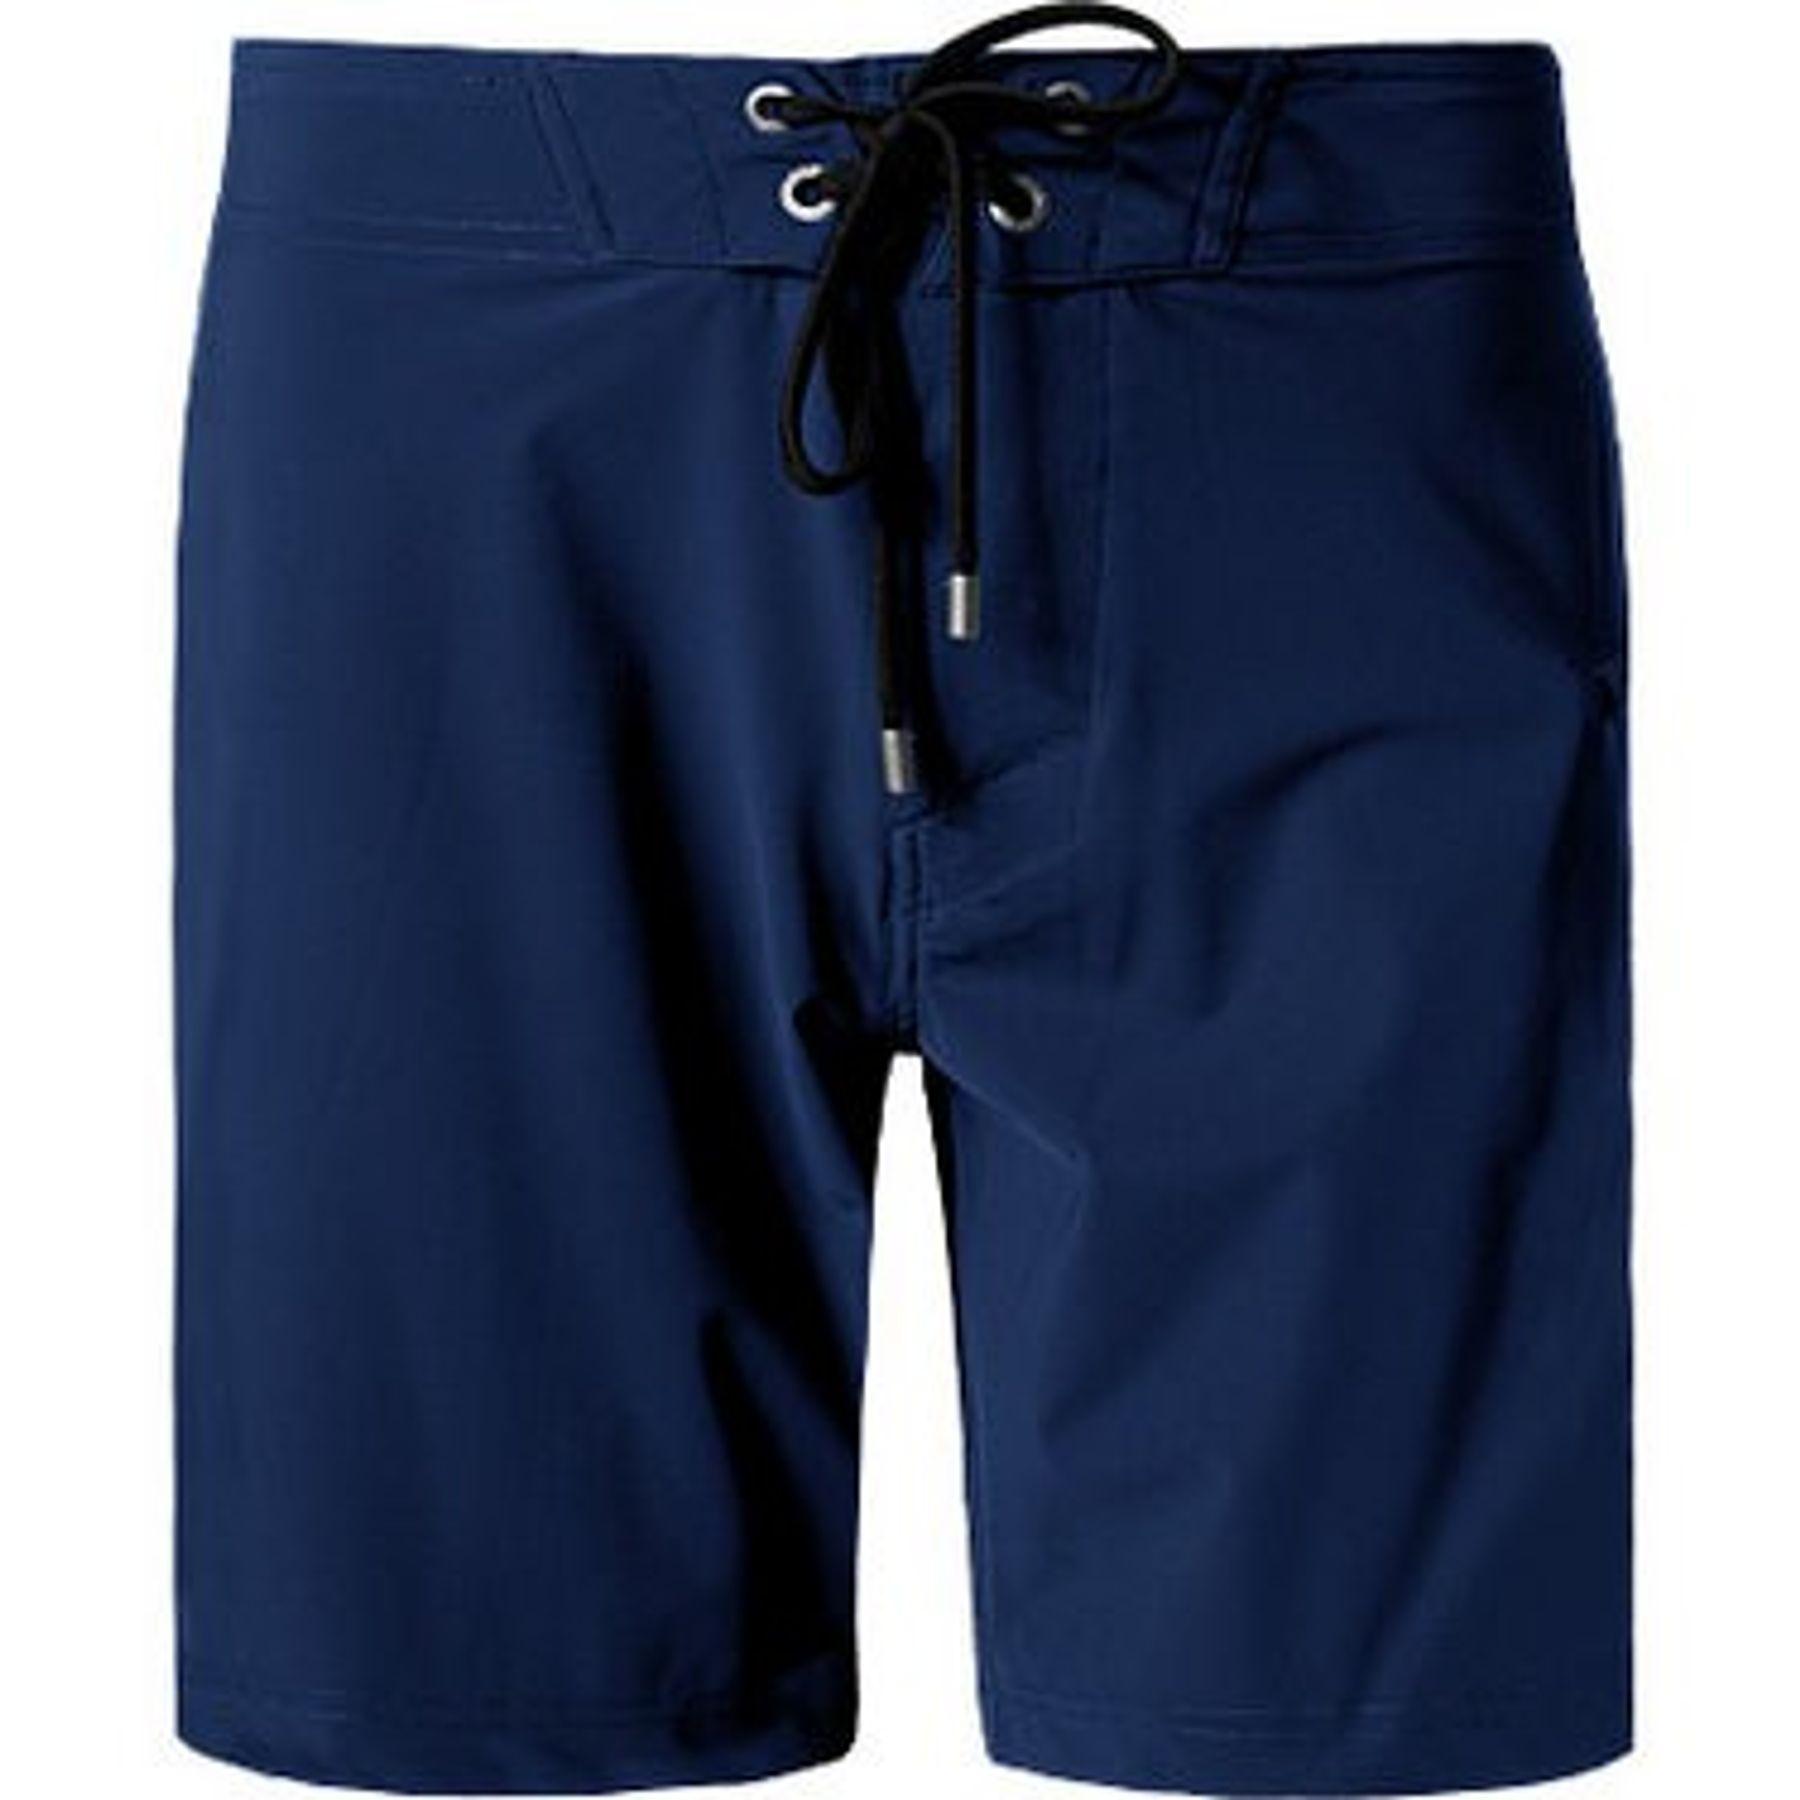 Jockey - Herren Long-Short Beachwear (60023) in 2 Farben – Bild 1